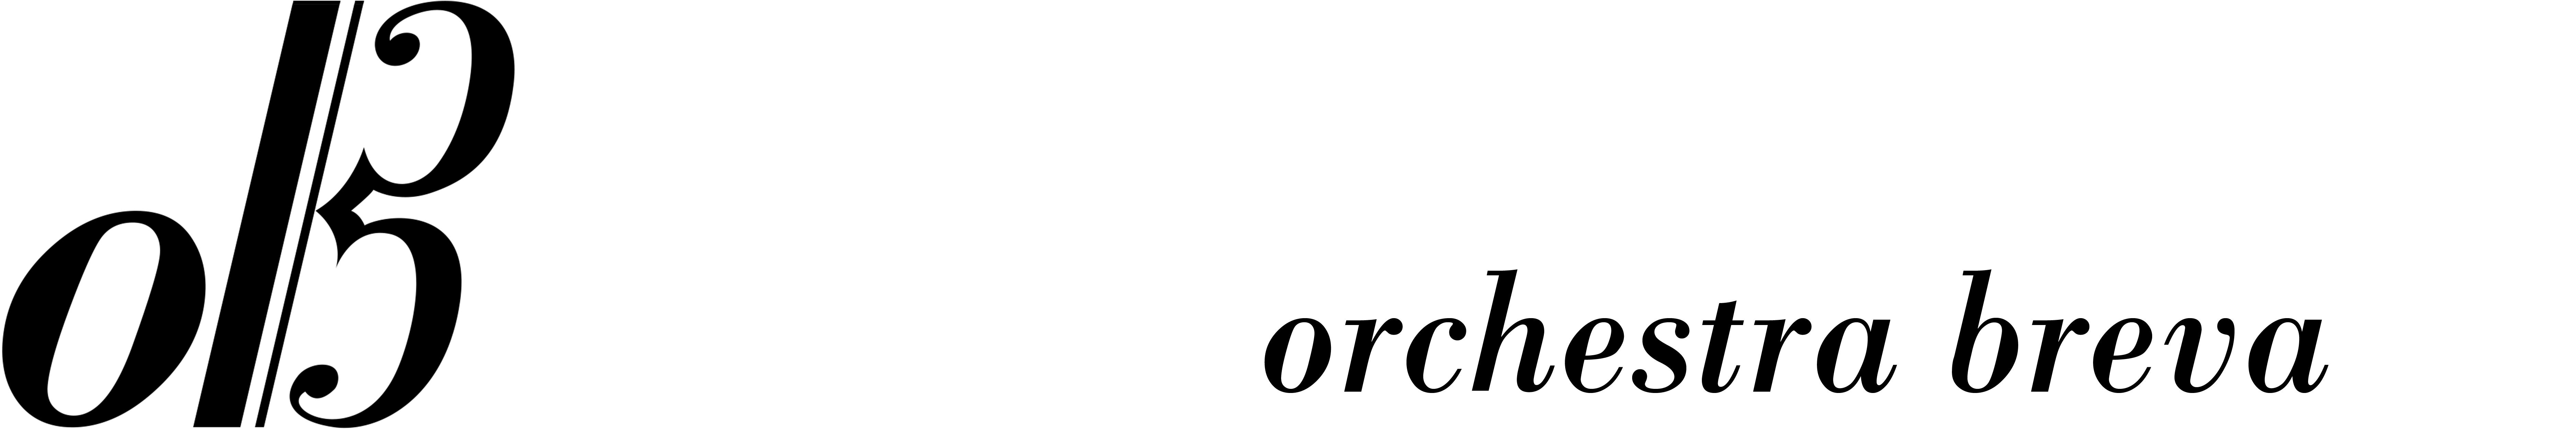 Orchestra Breva | Melanie Paul Tanovich